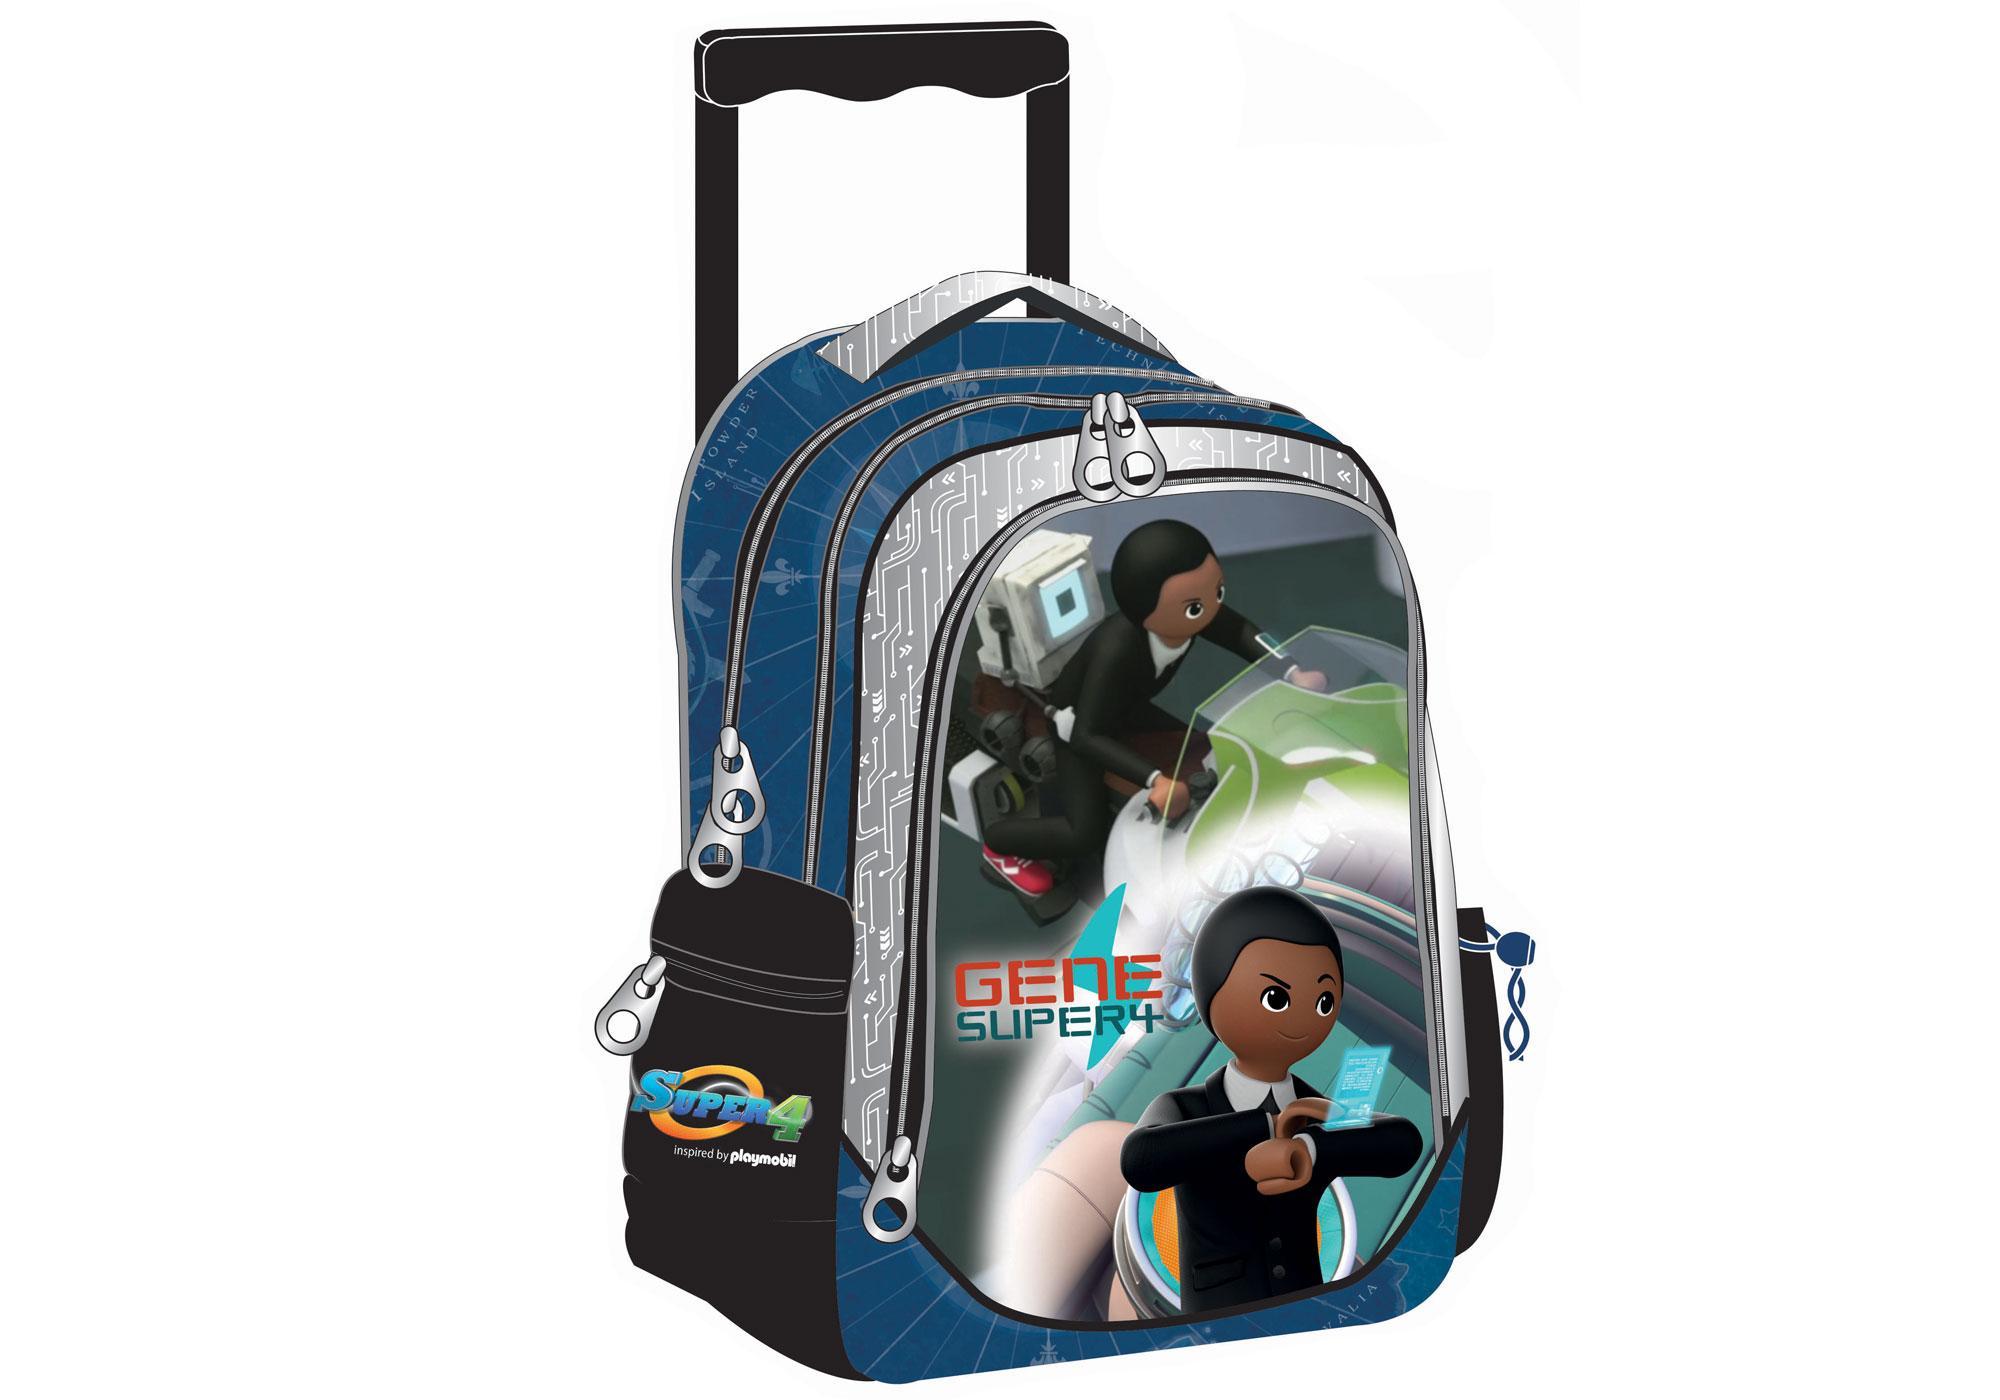 http://media.playmobil.com/i/playmobil/80073_product_detail/Kinder-Trolley - Super 4 Gene